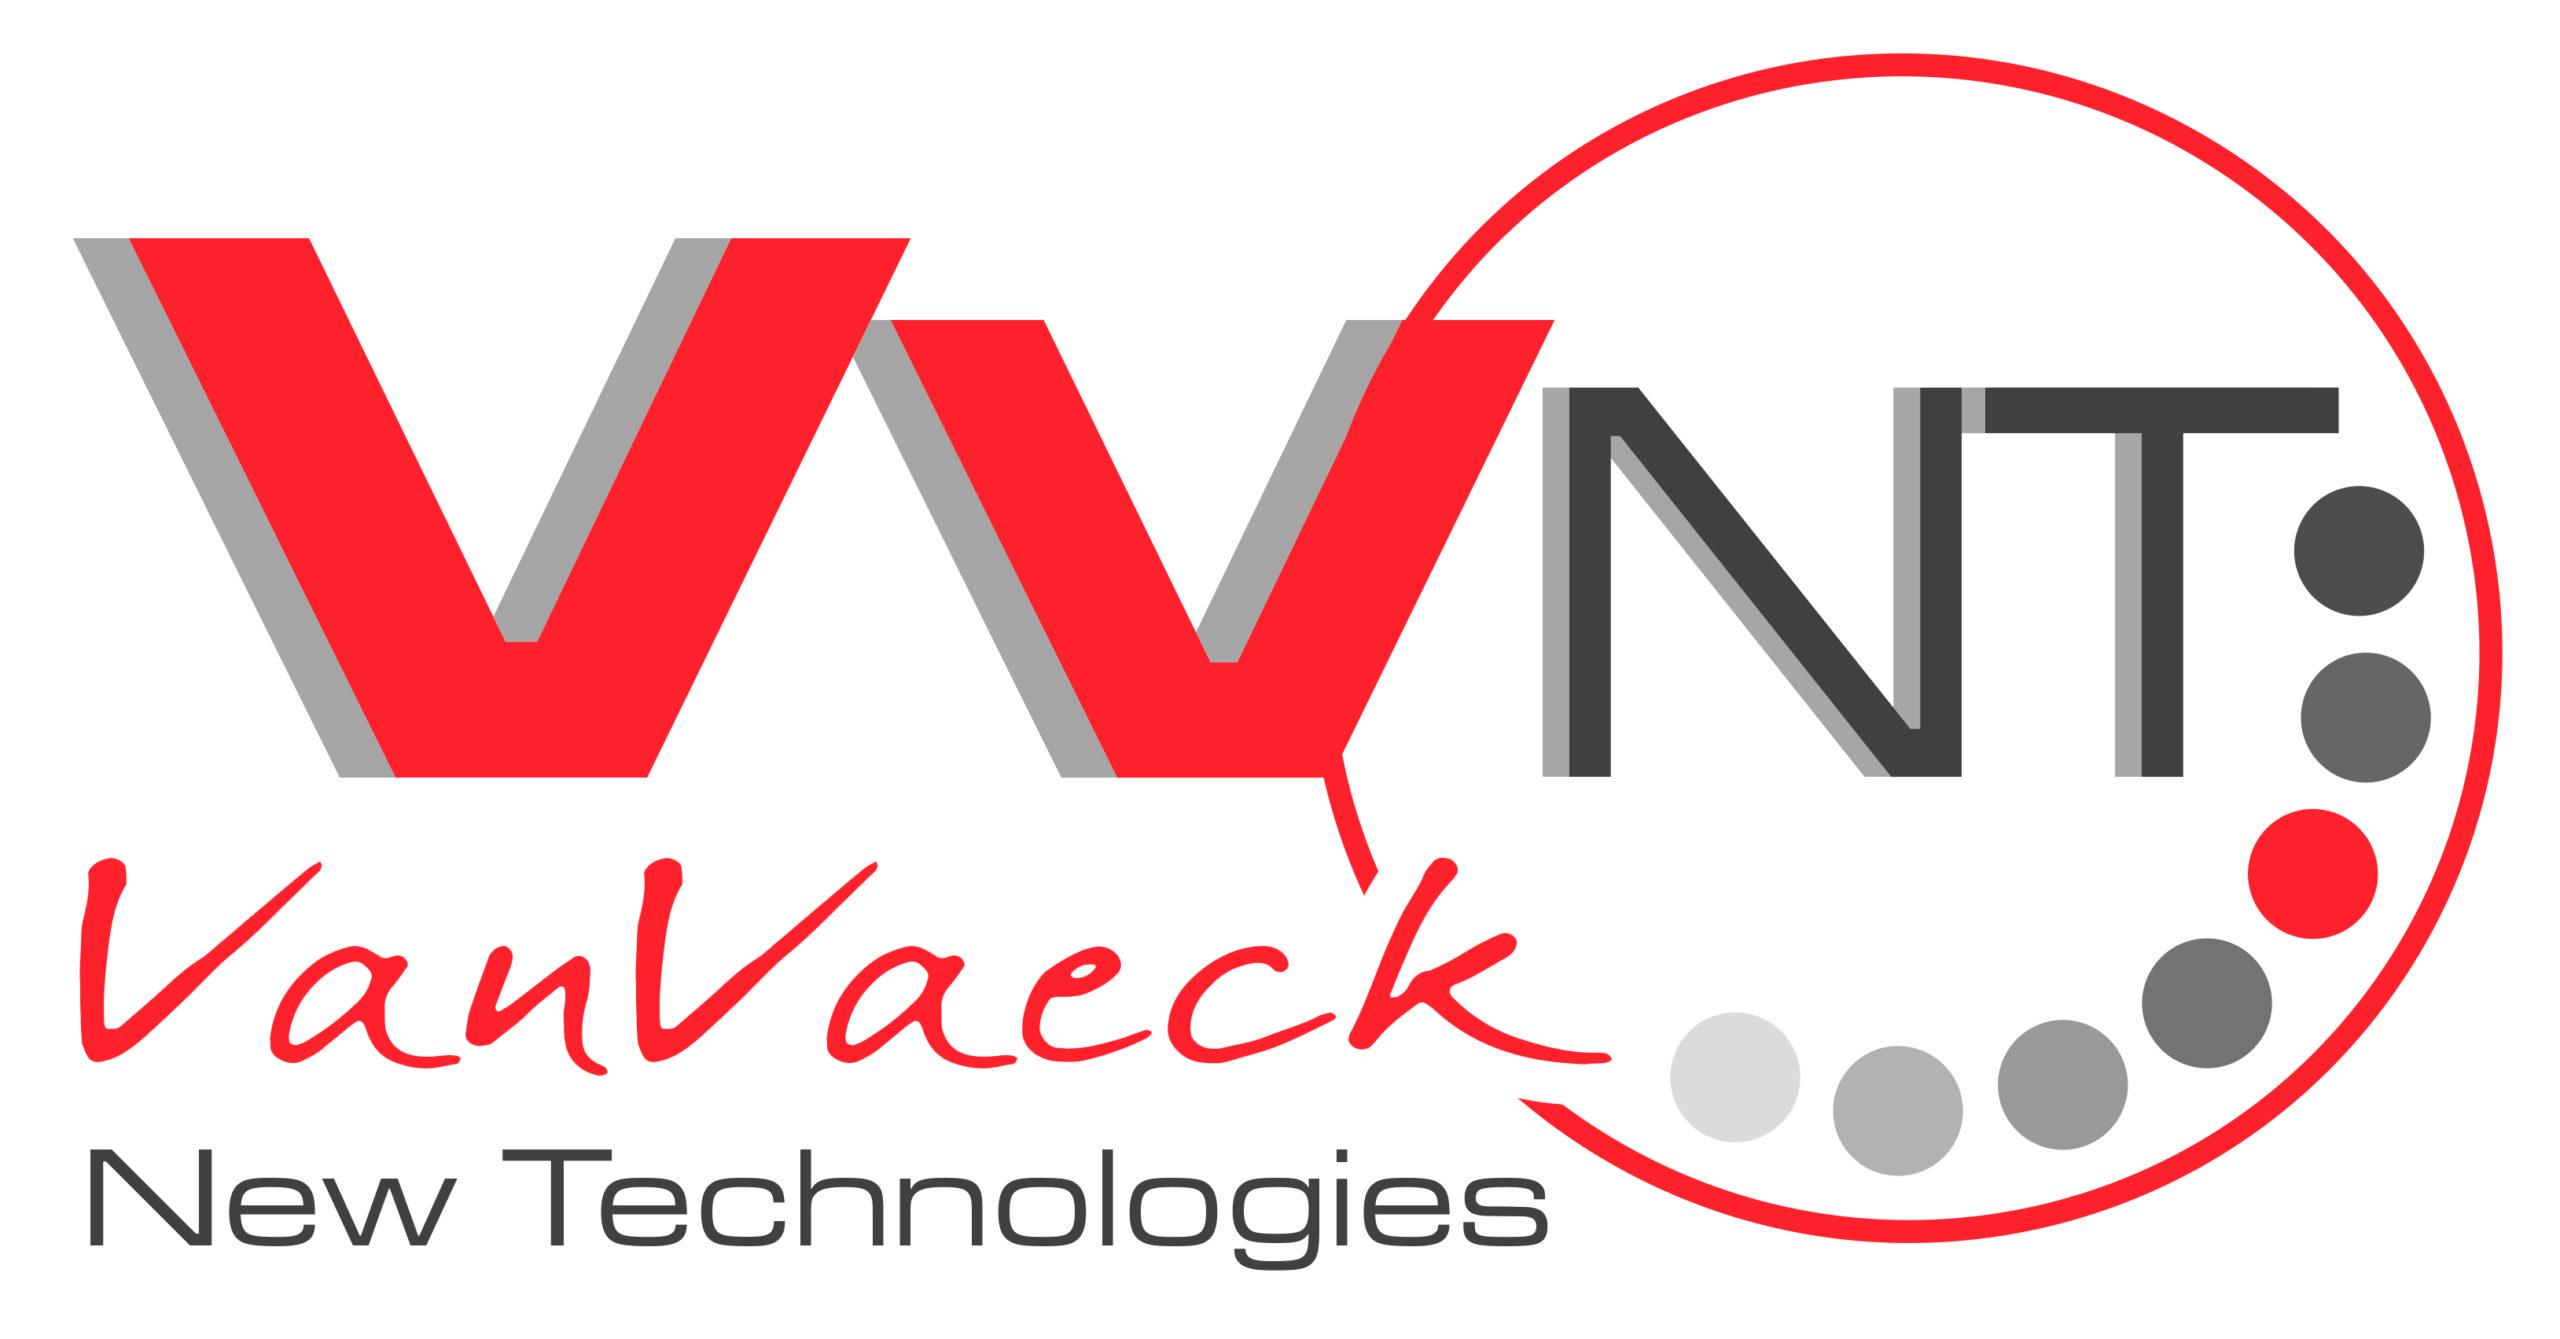 VVNT Blog